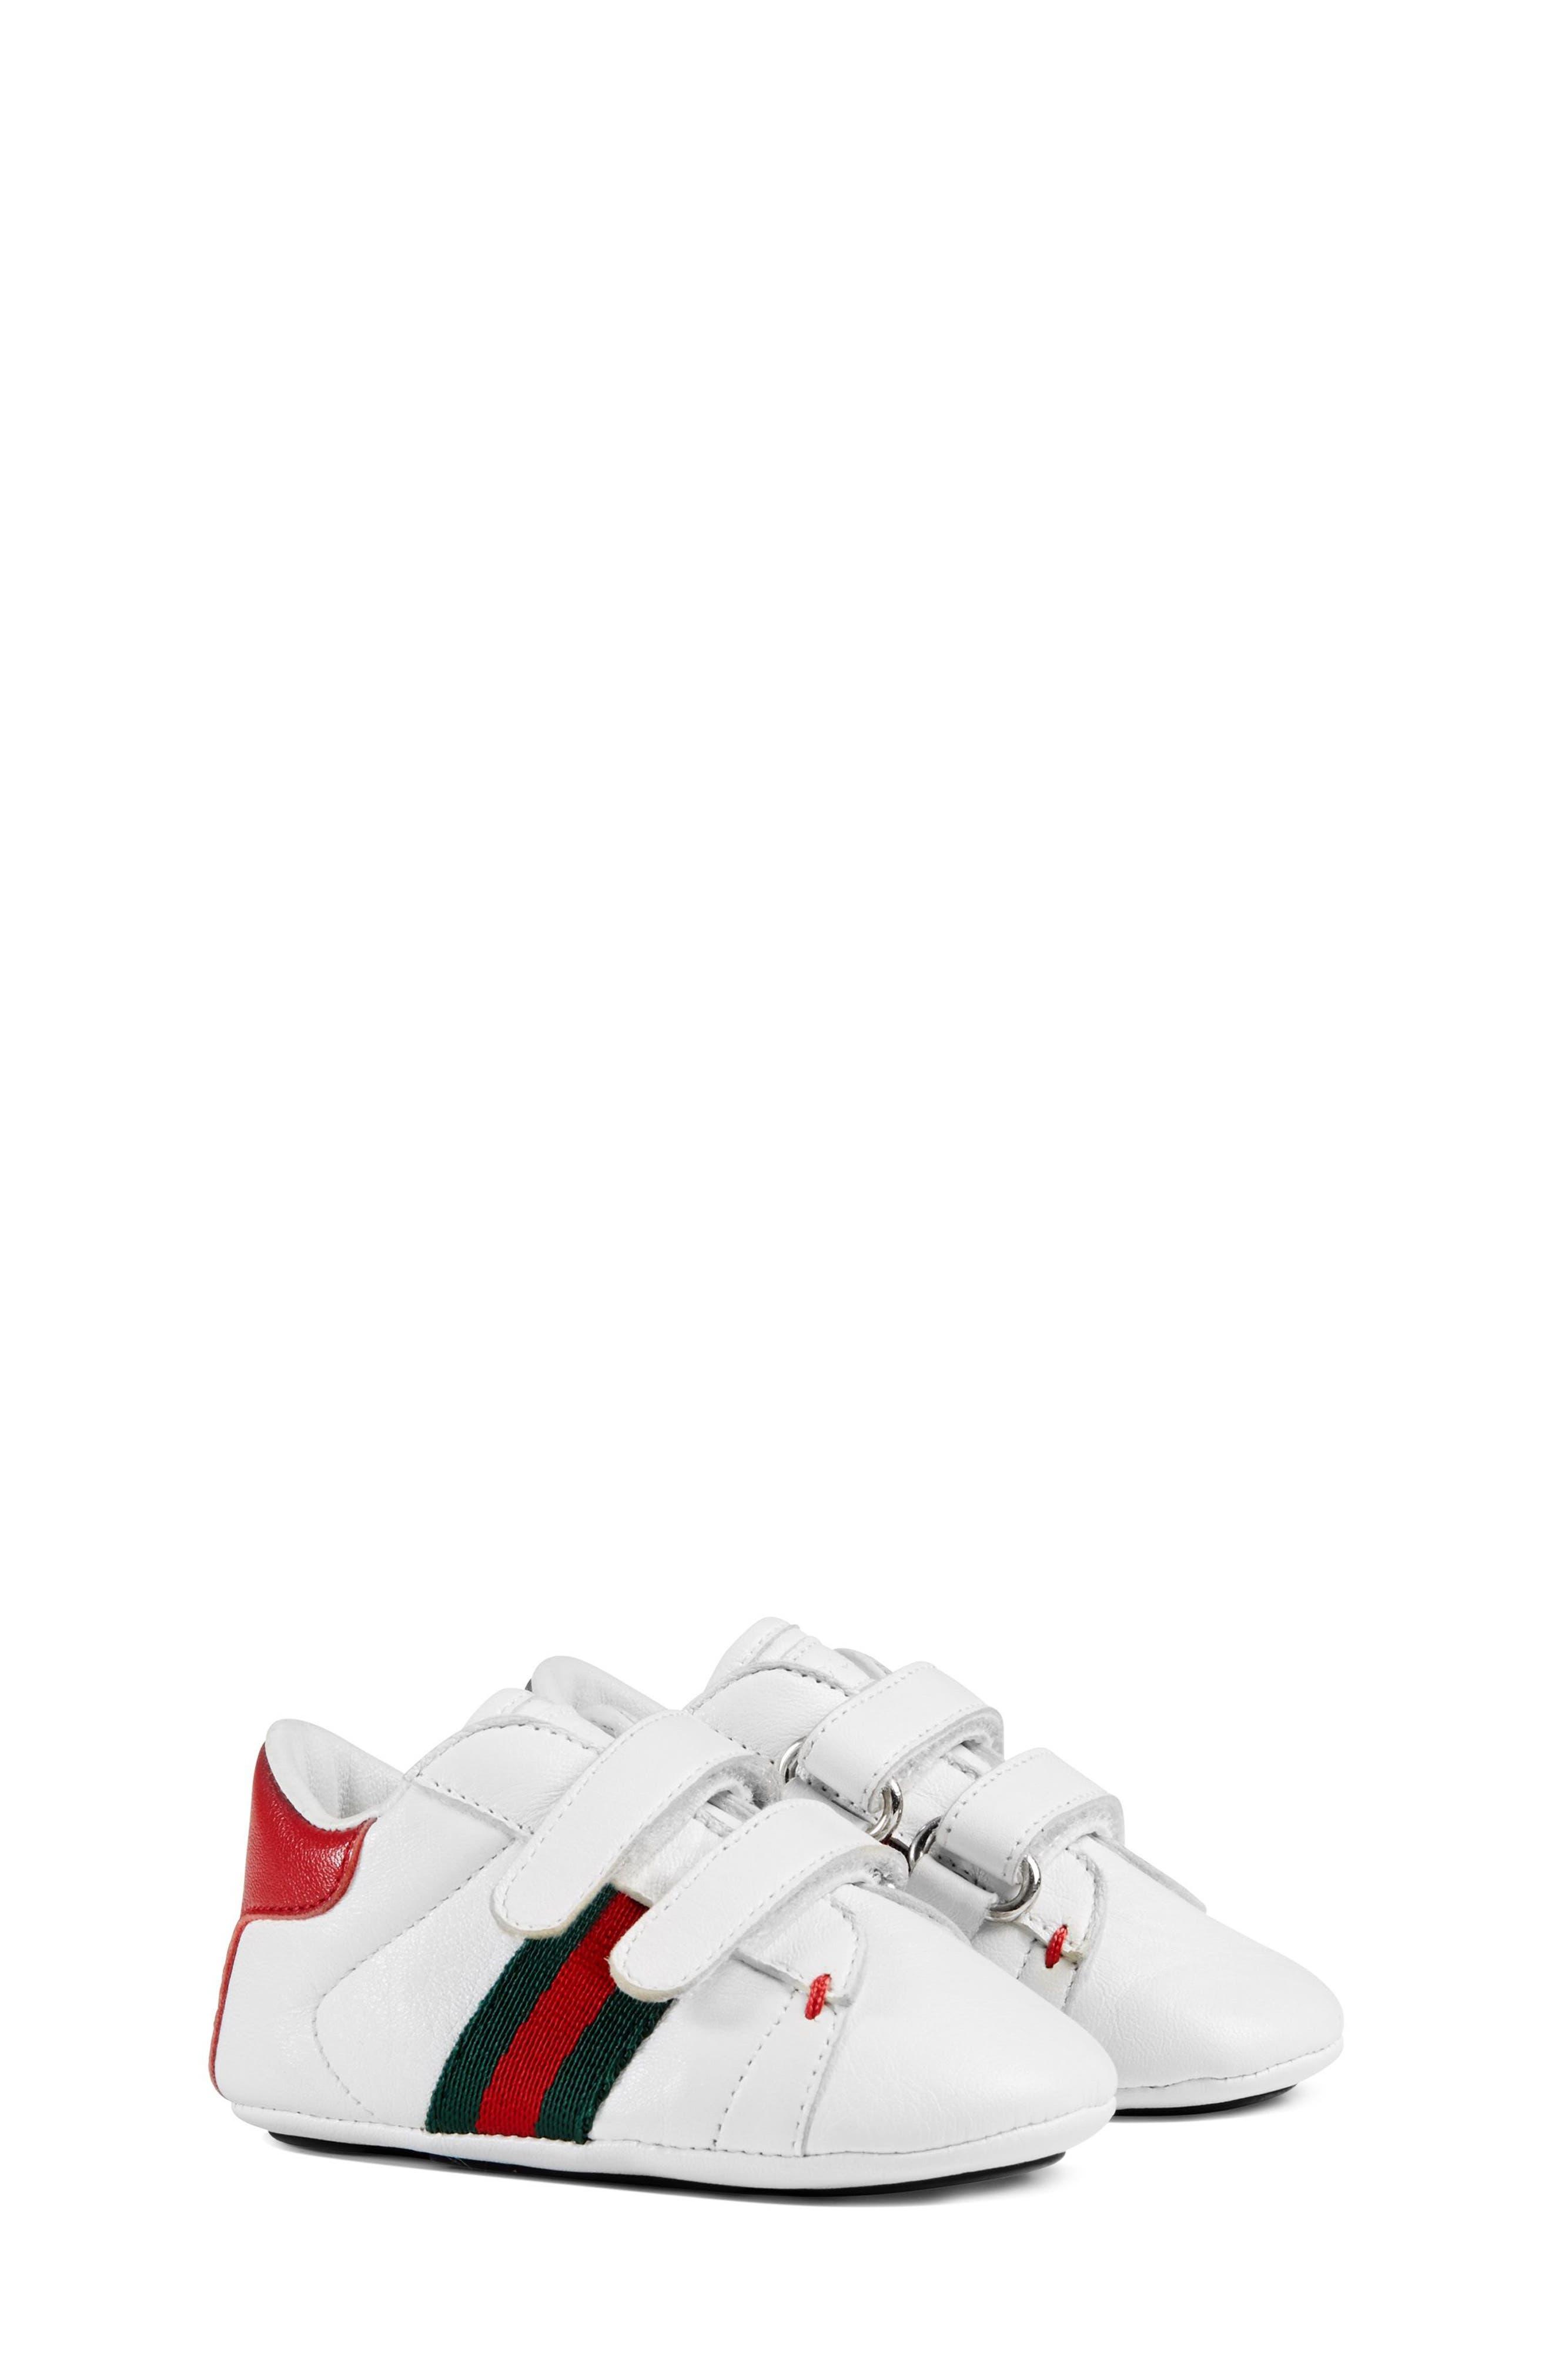 'Ace' Crib Shoe,                         Main,                         color, 100